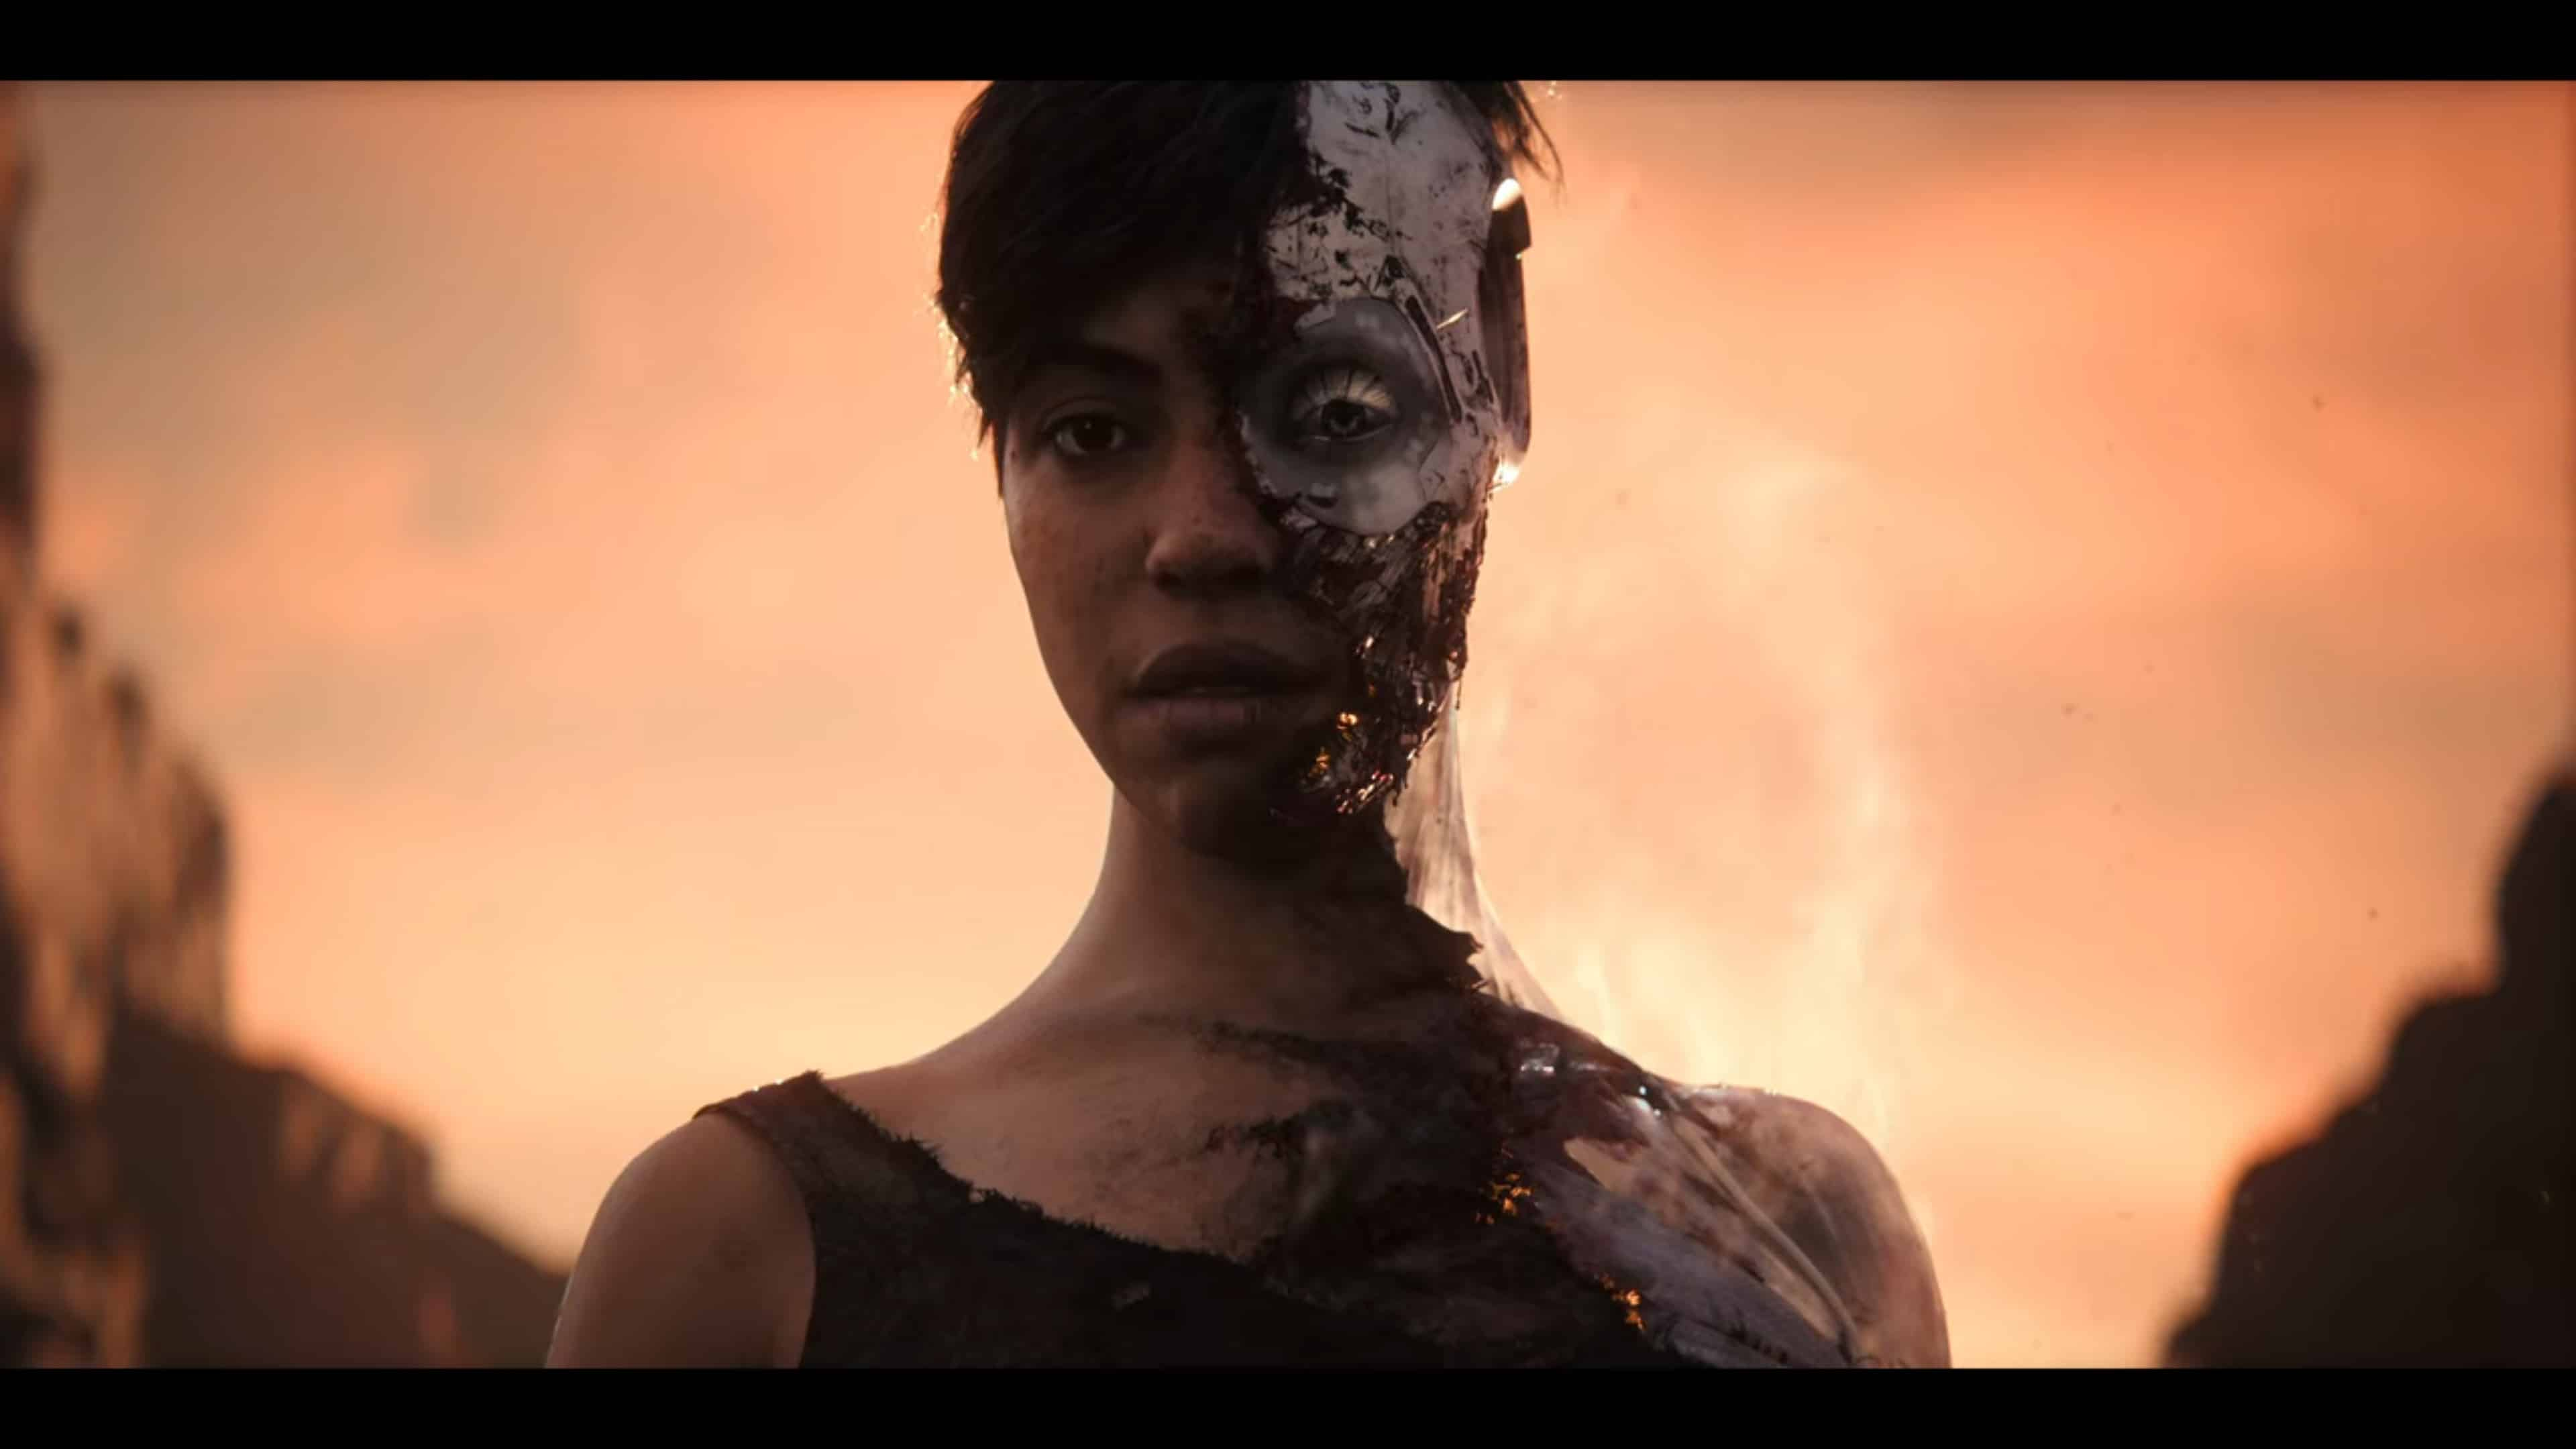 Hirald (Zita Hanrot), after the merchant shot her in th head